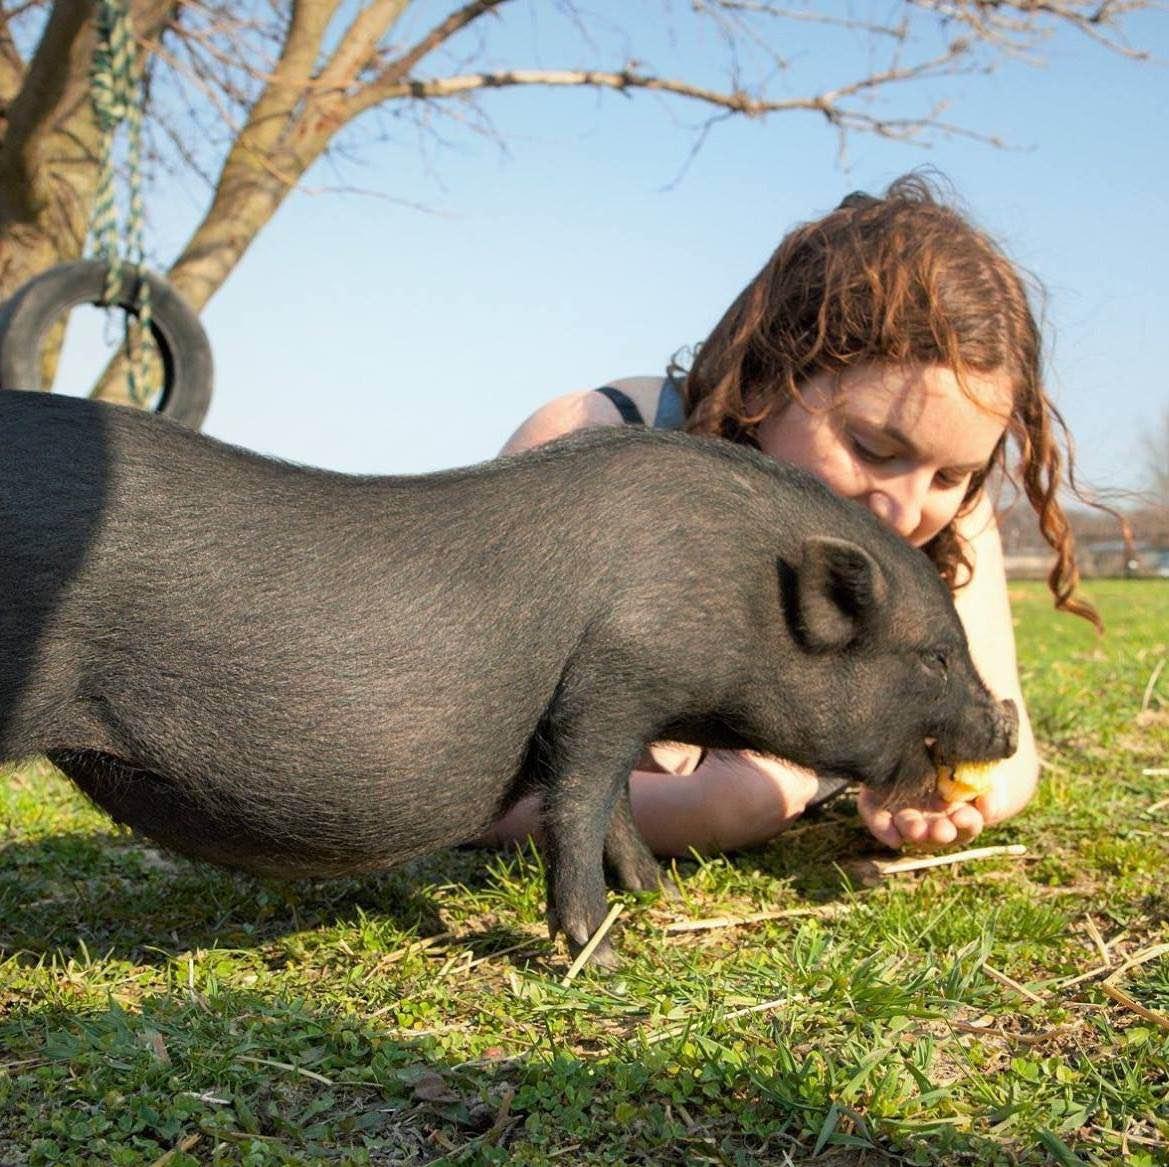 Activist Eva Hamer hanging out with a pig friend